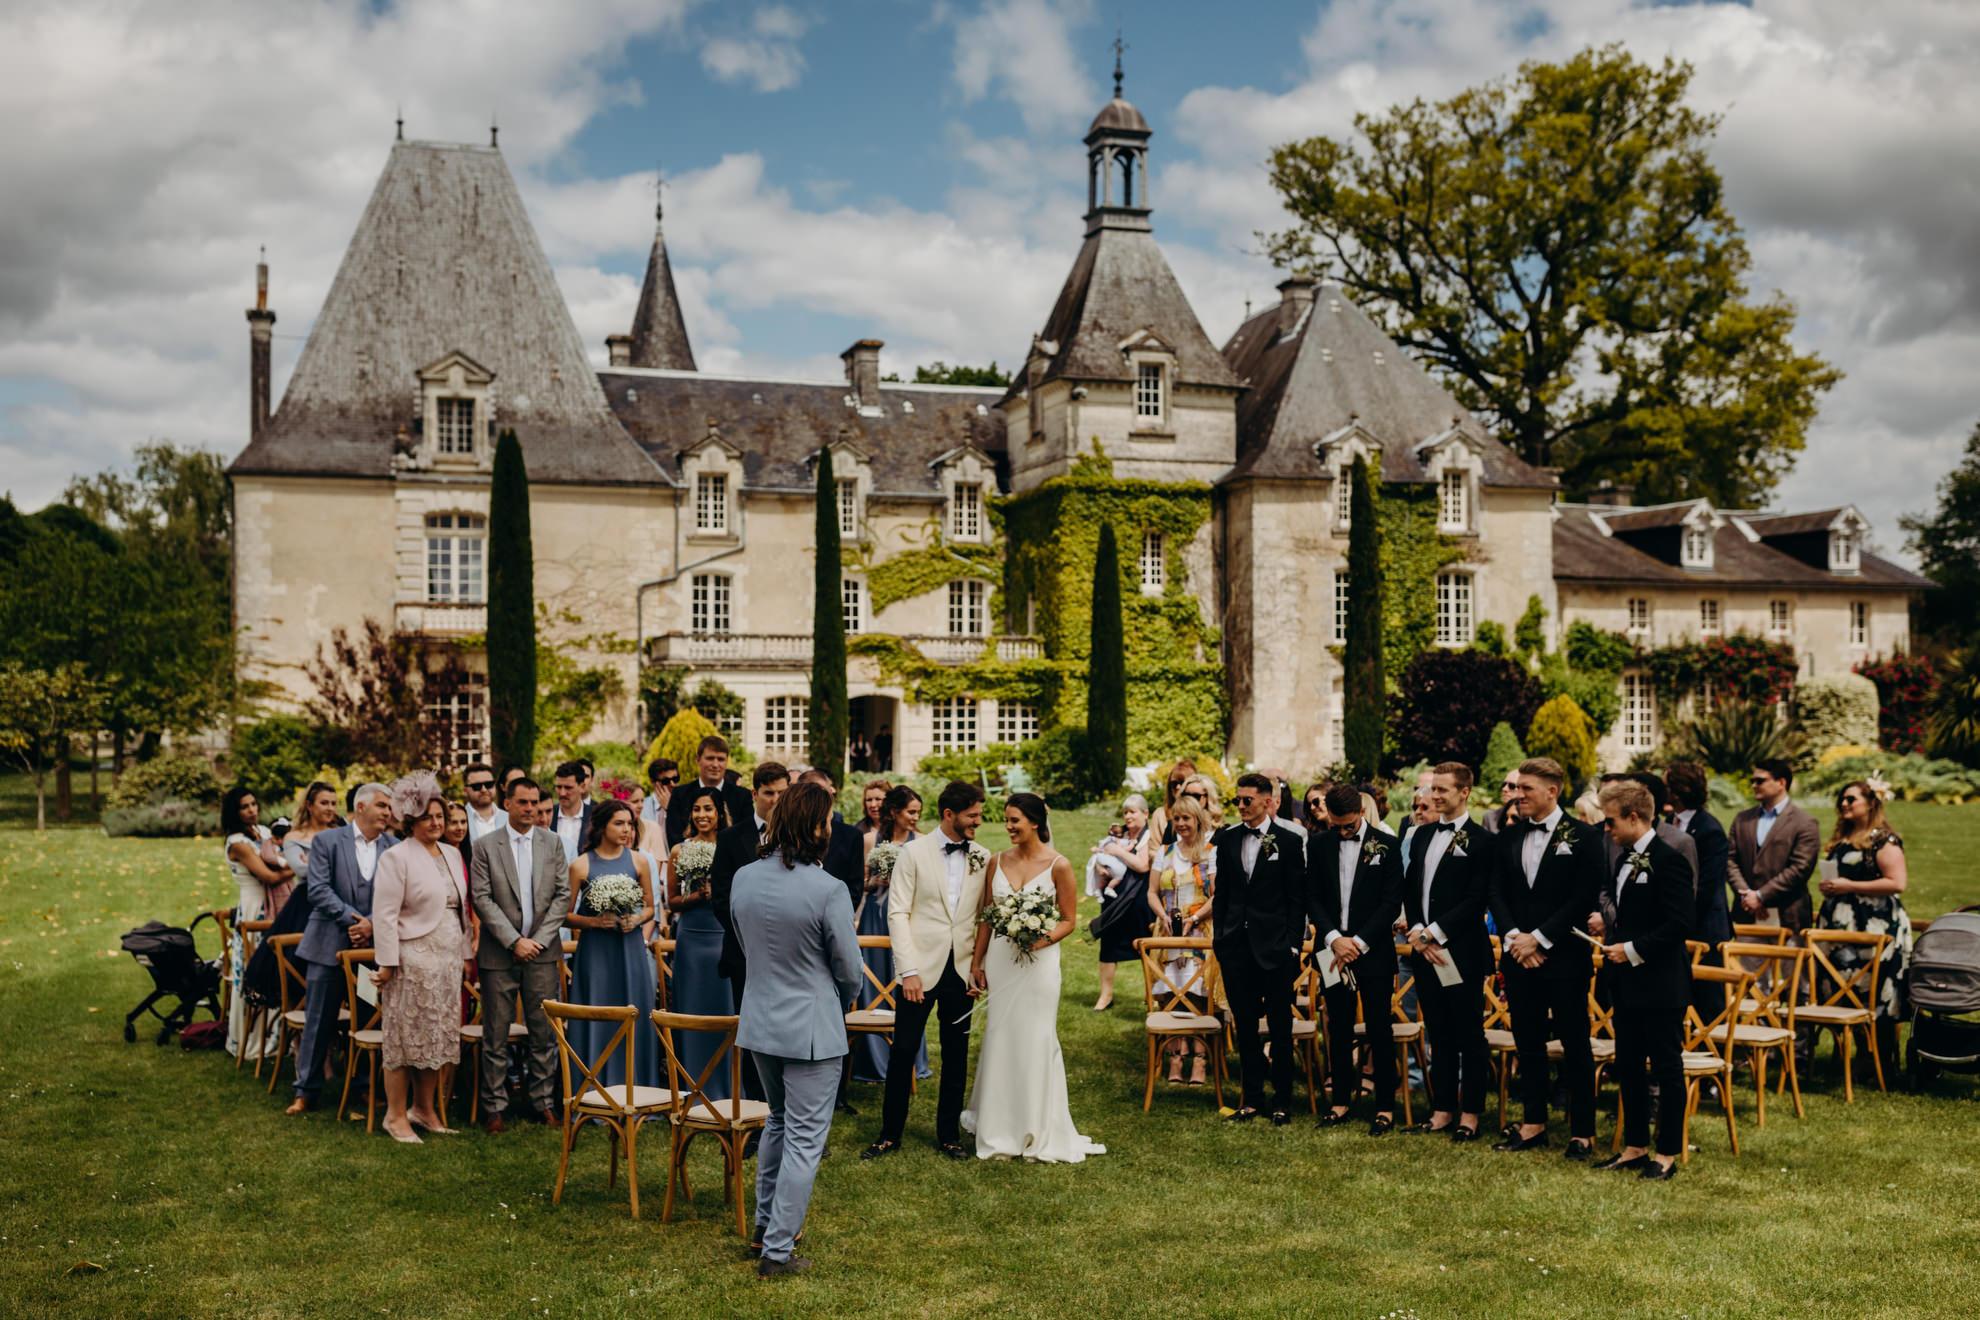 Le mas de montet wedding